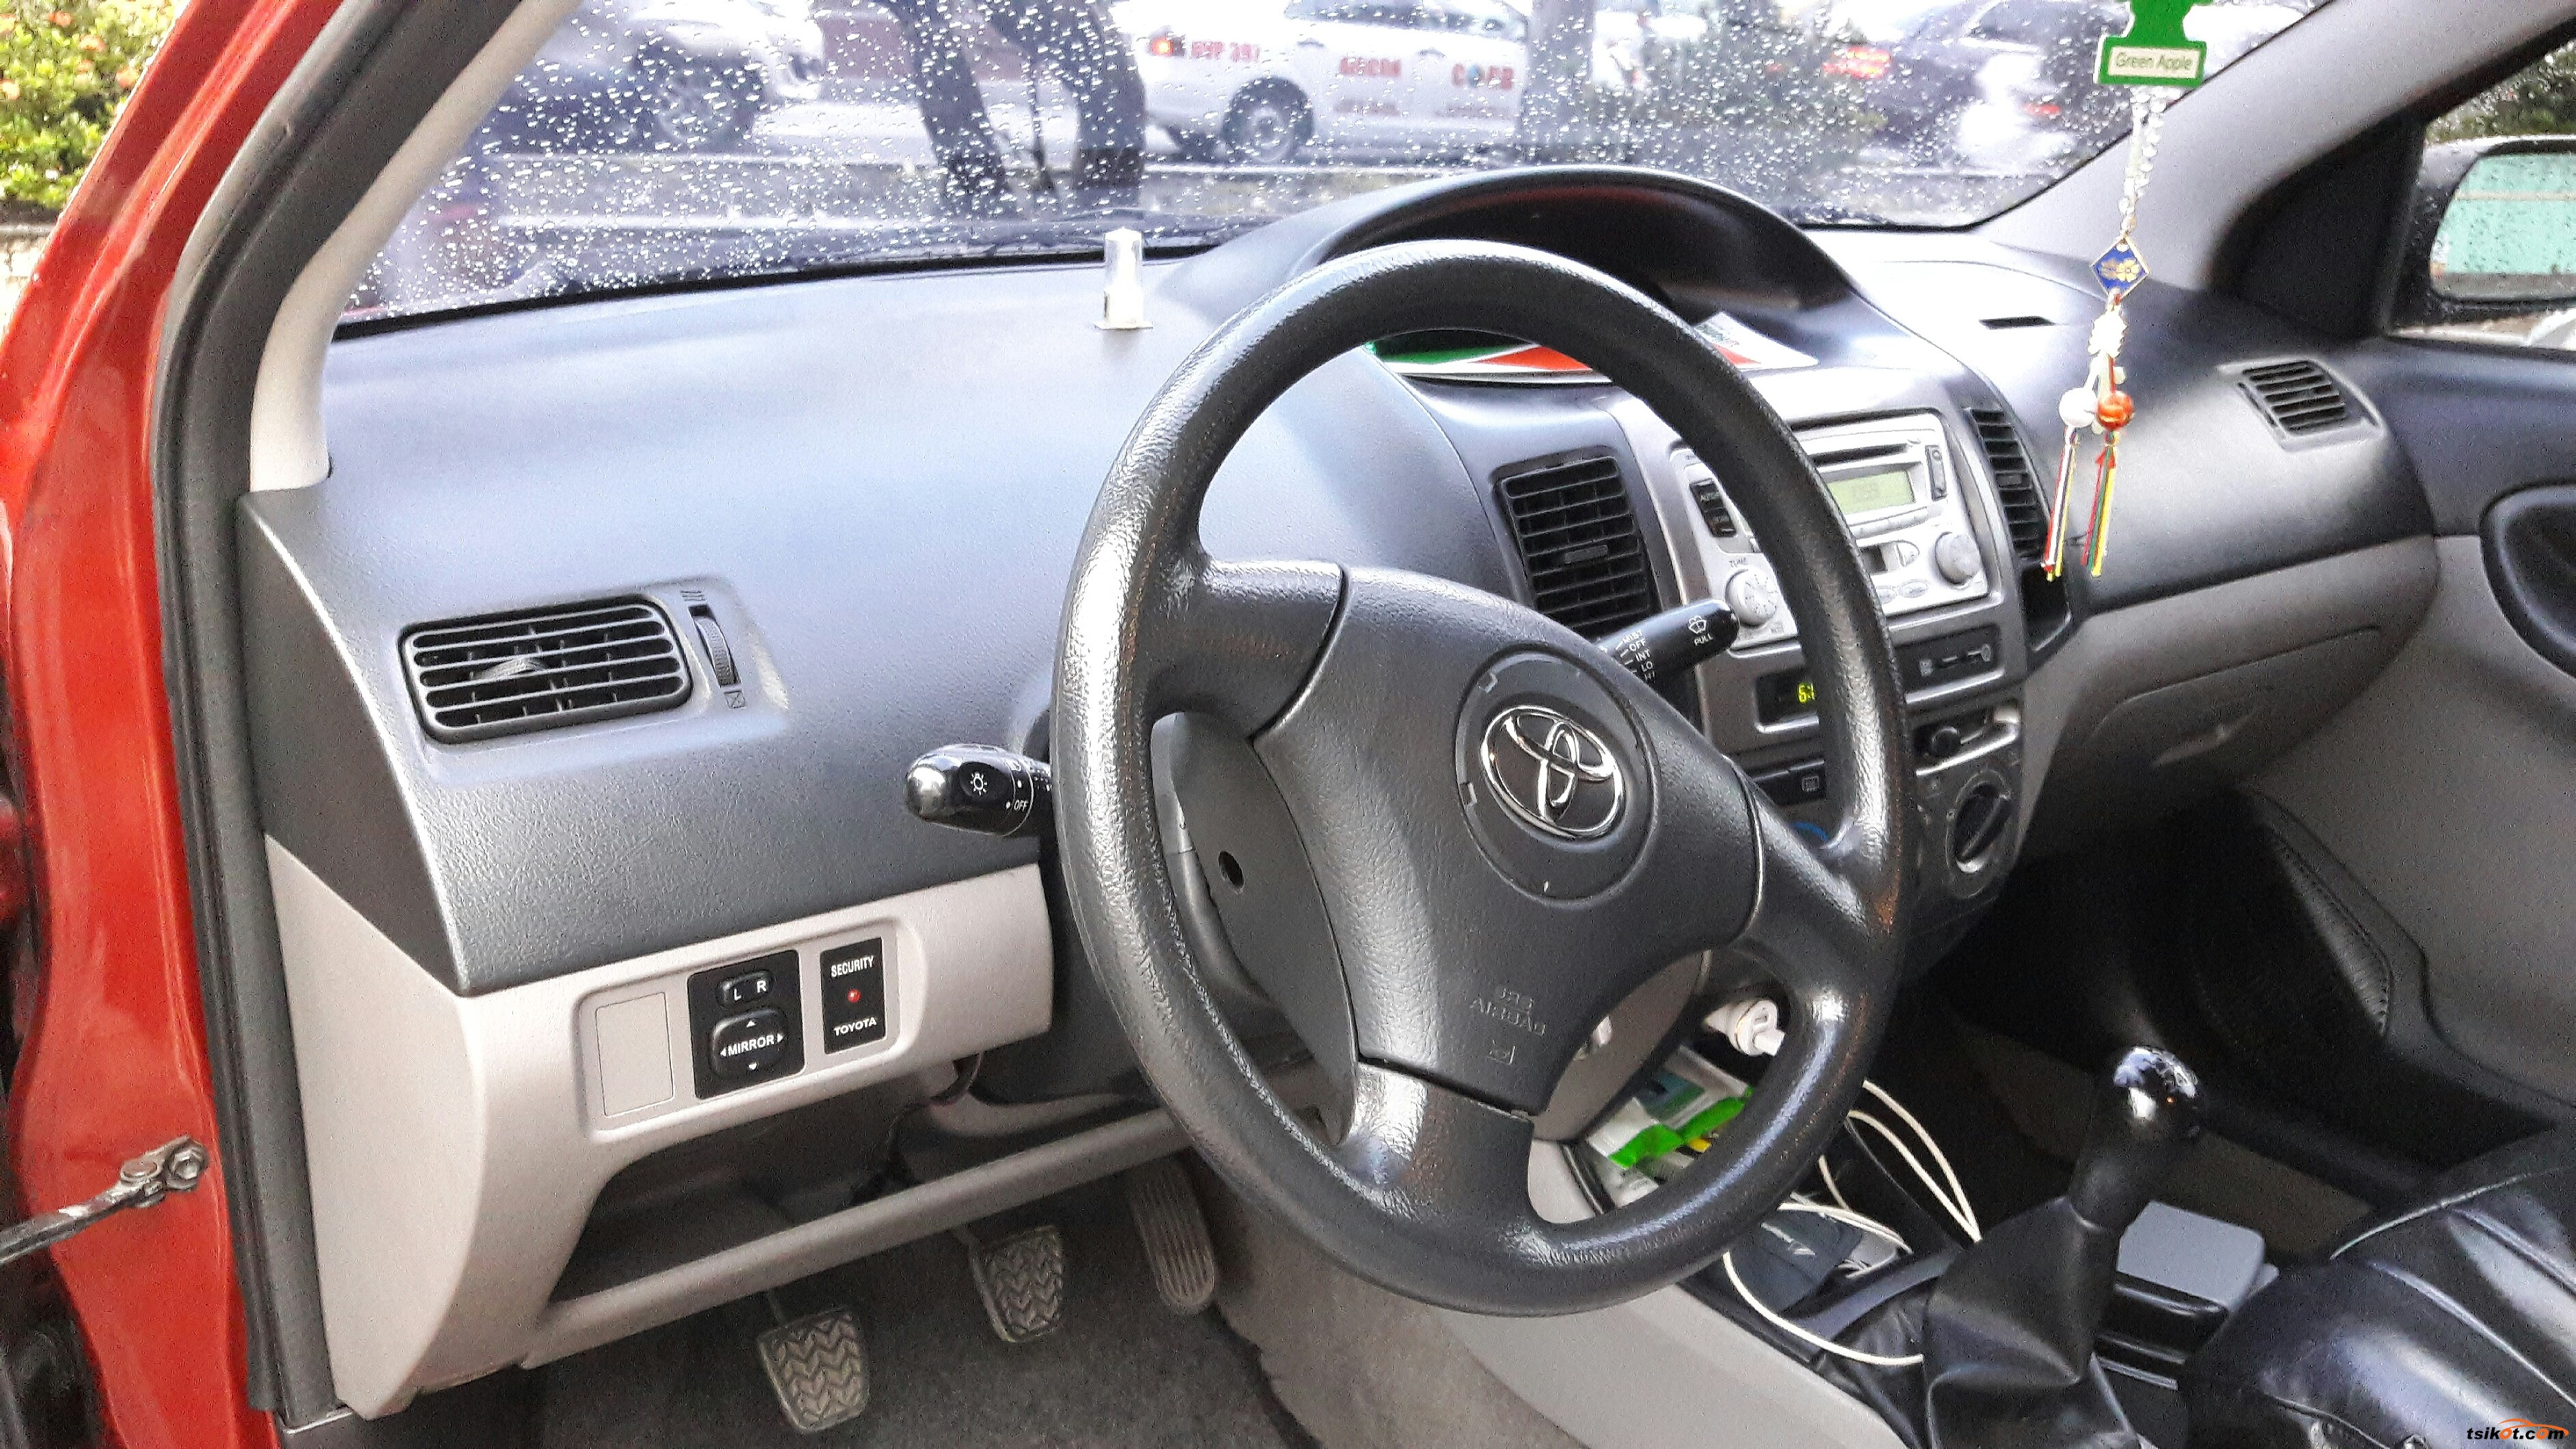 Toyota Vios 2005 - 5